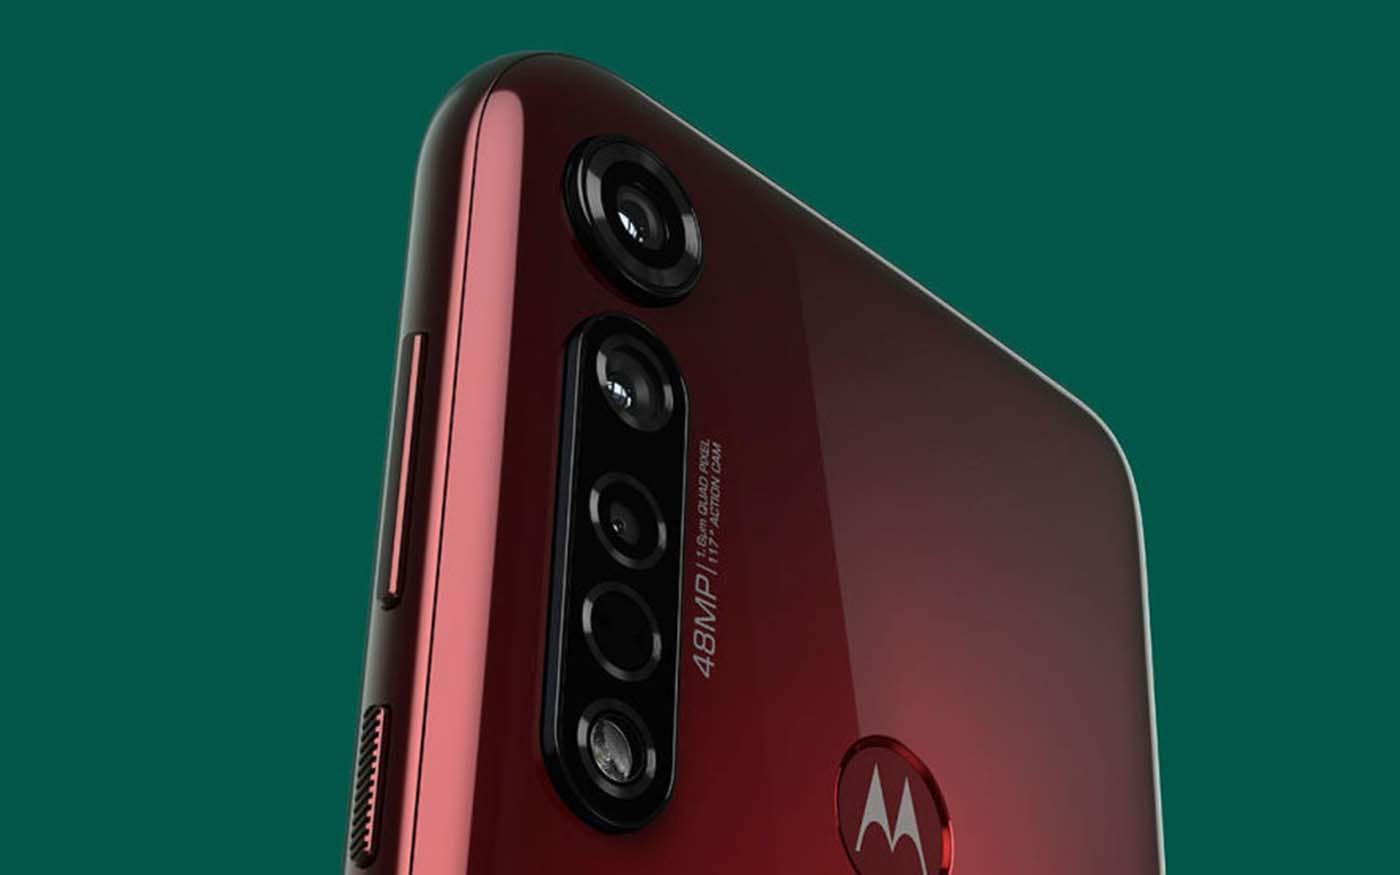 Motorola Edge+ é visto no Geekbench com Snapdragon 865 e 12GB de RAM